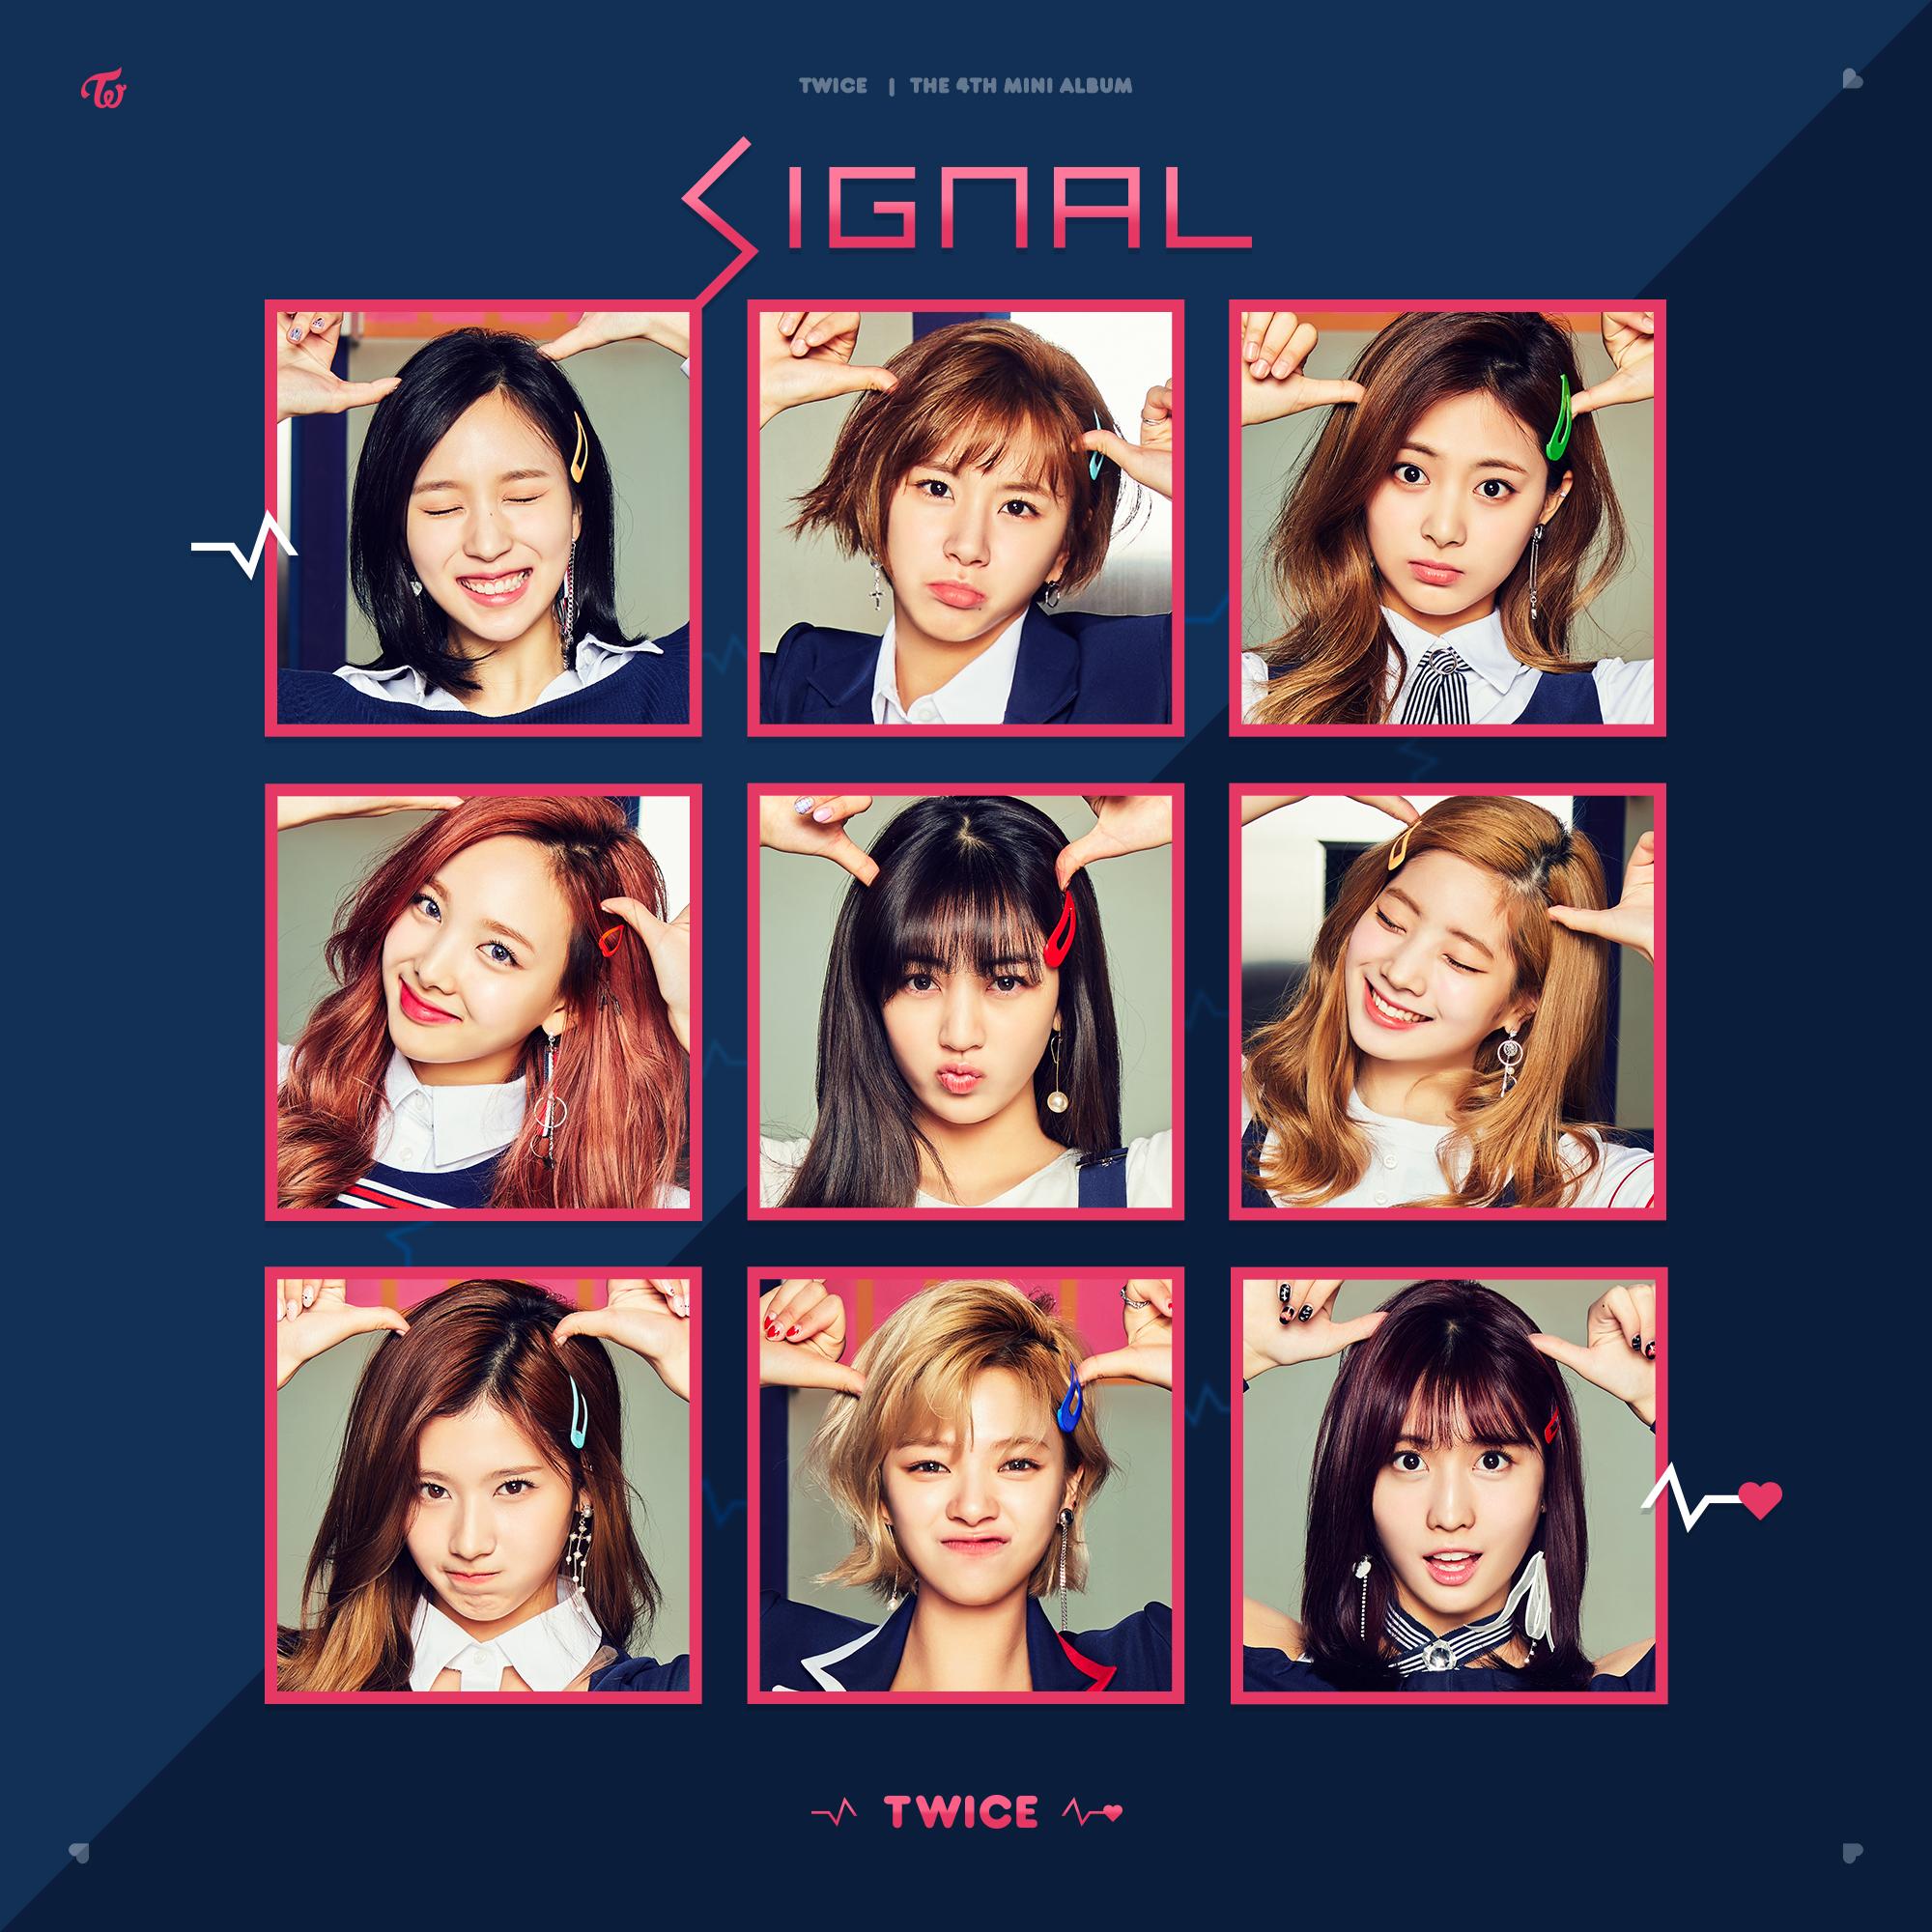 20170518.1644.09 Twice - Signal cover.jpg